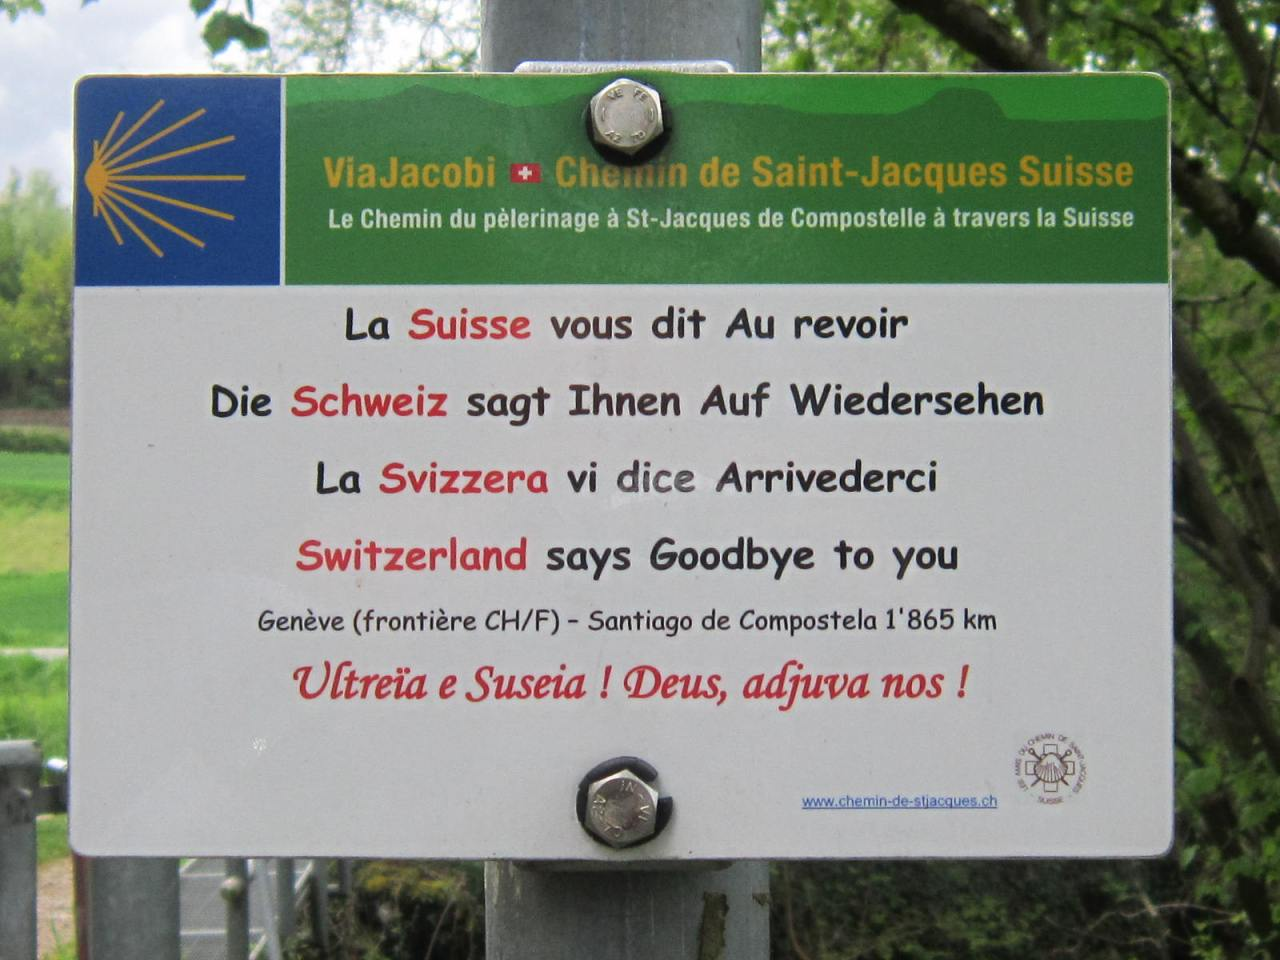 Leaving the Jakobsweg Suisse and beginning the Geneva Way (ViaGebennensis)